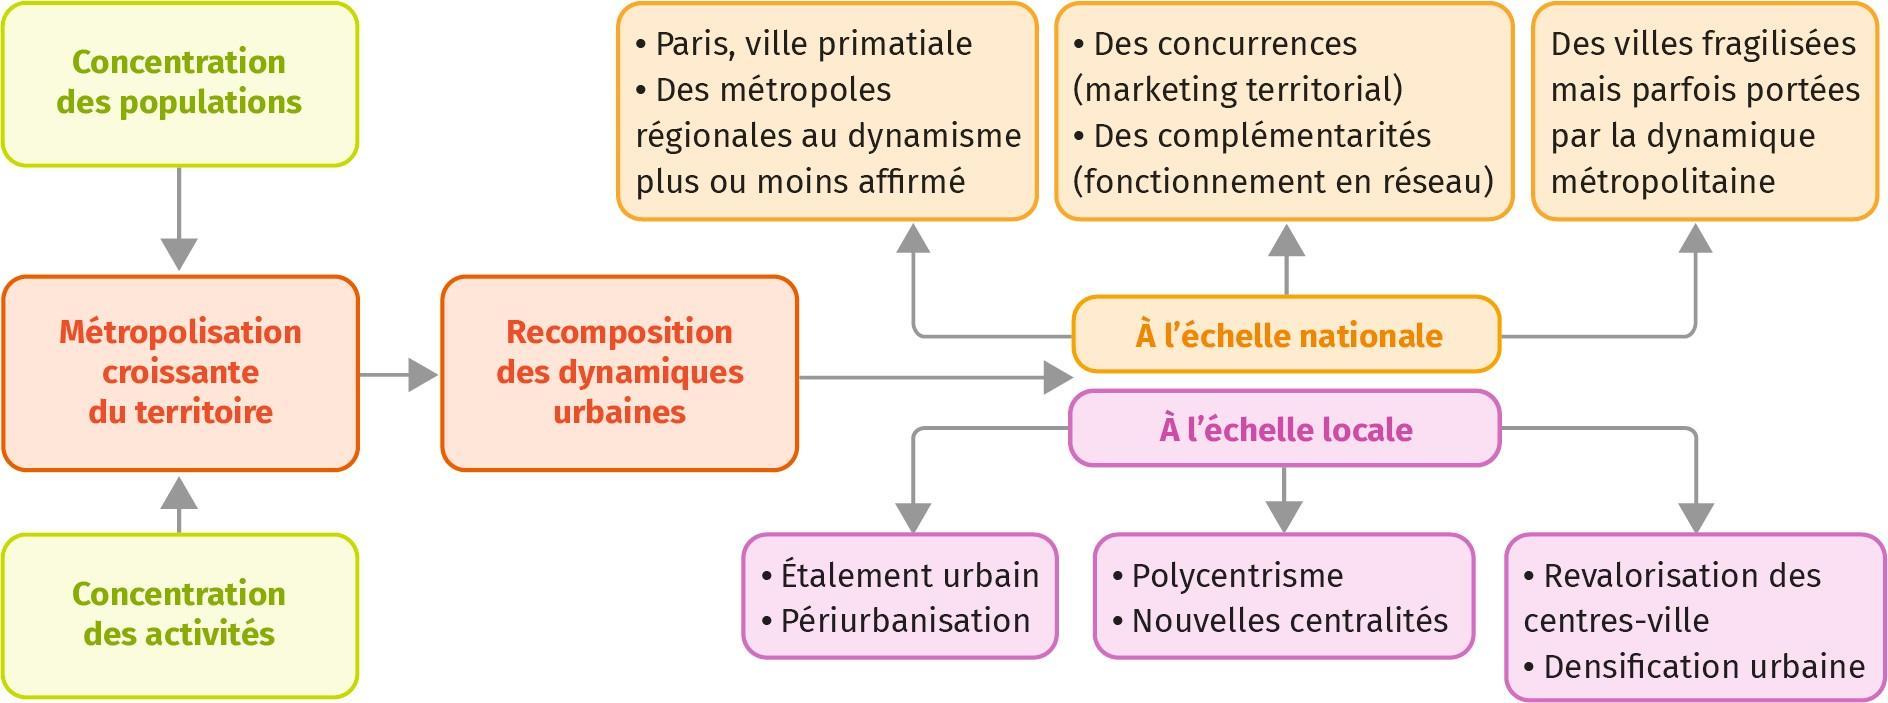 schéma de synthèse